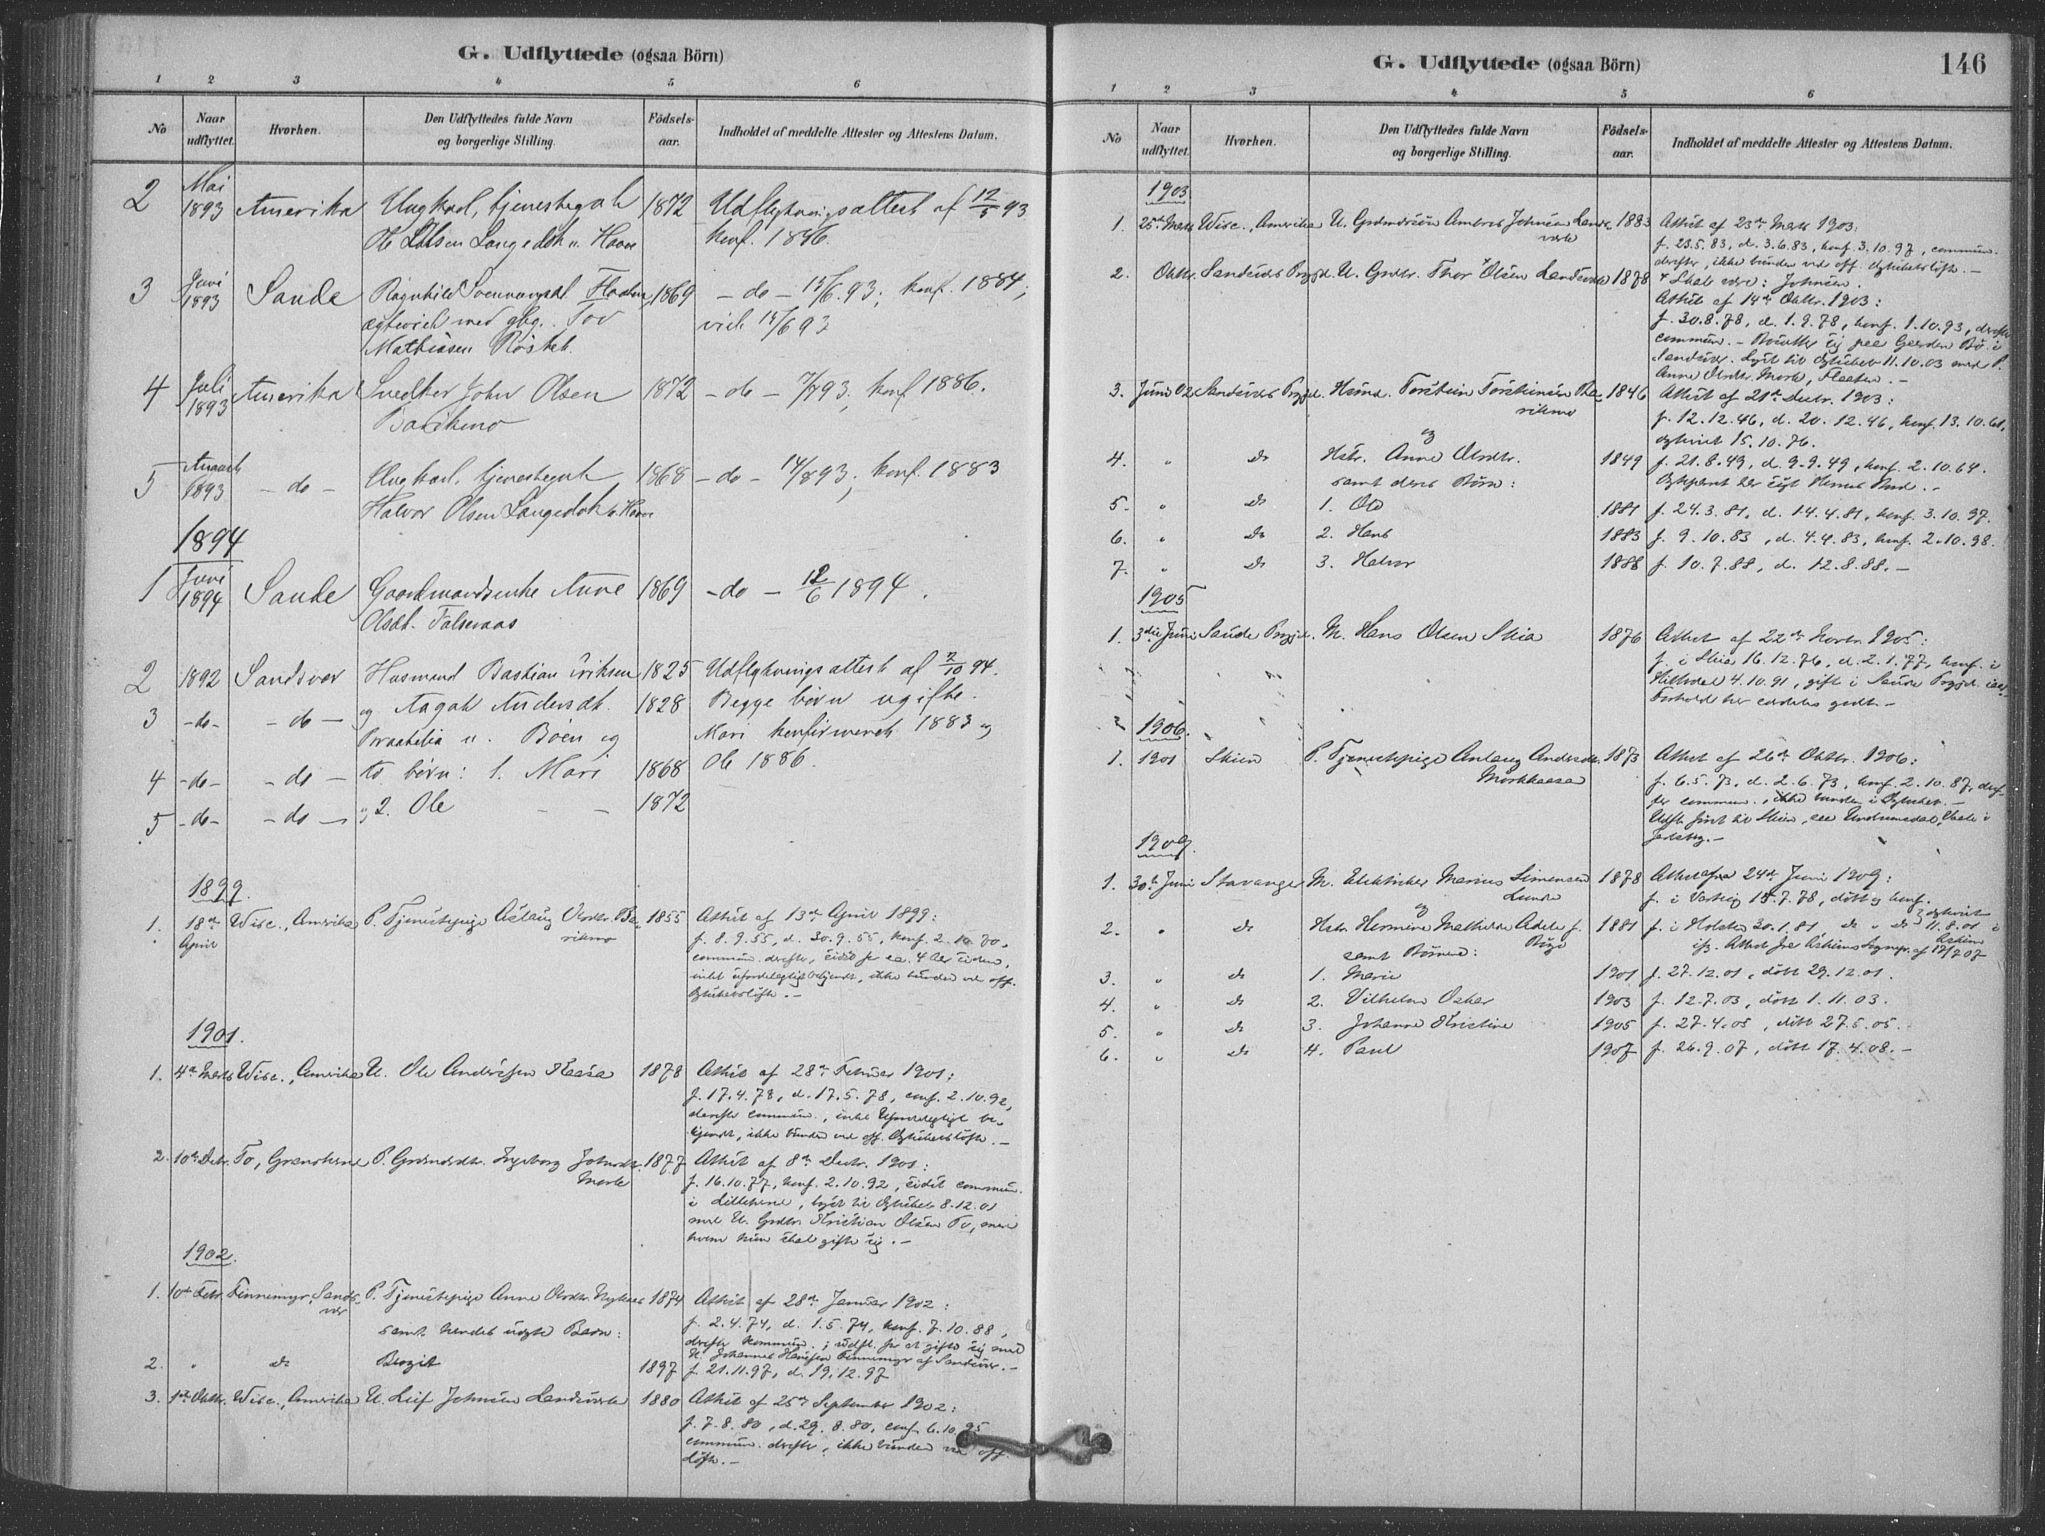 SAKO, Heddal kirkebøker, F/Fb/L0002: Ministerialbok nr. II 2, 1878-1913, s. 146